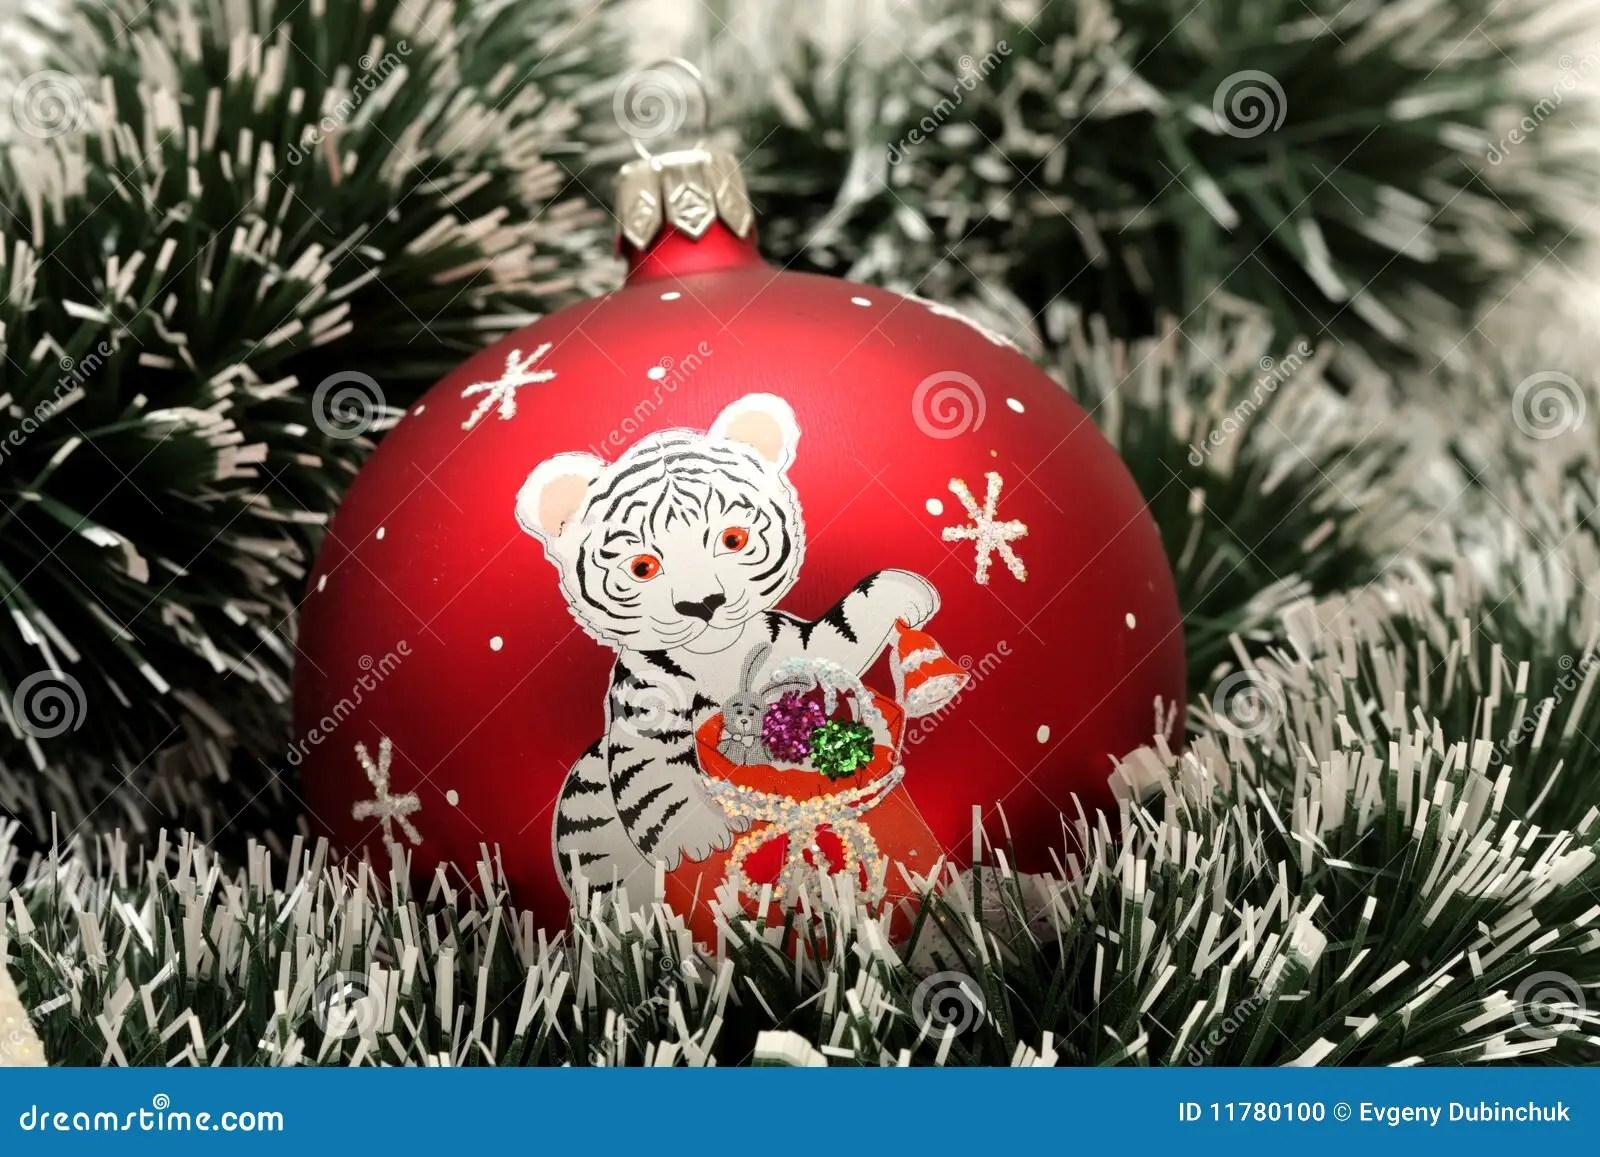 Christmas Ball With Drawing Of Tiger Stock Photo Image